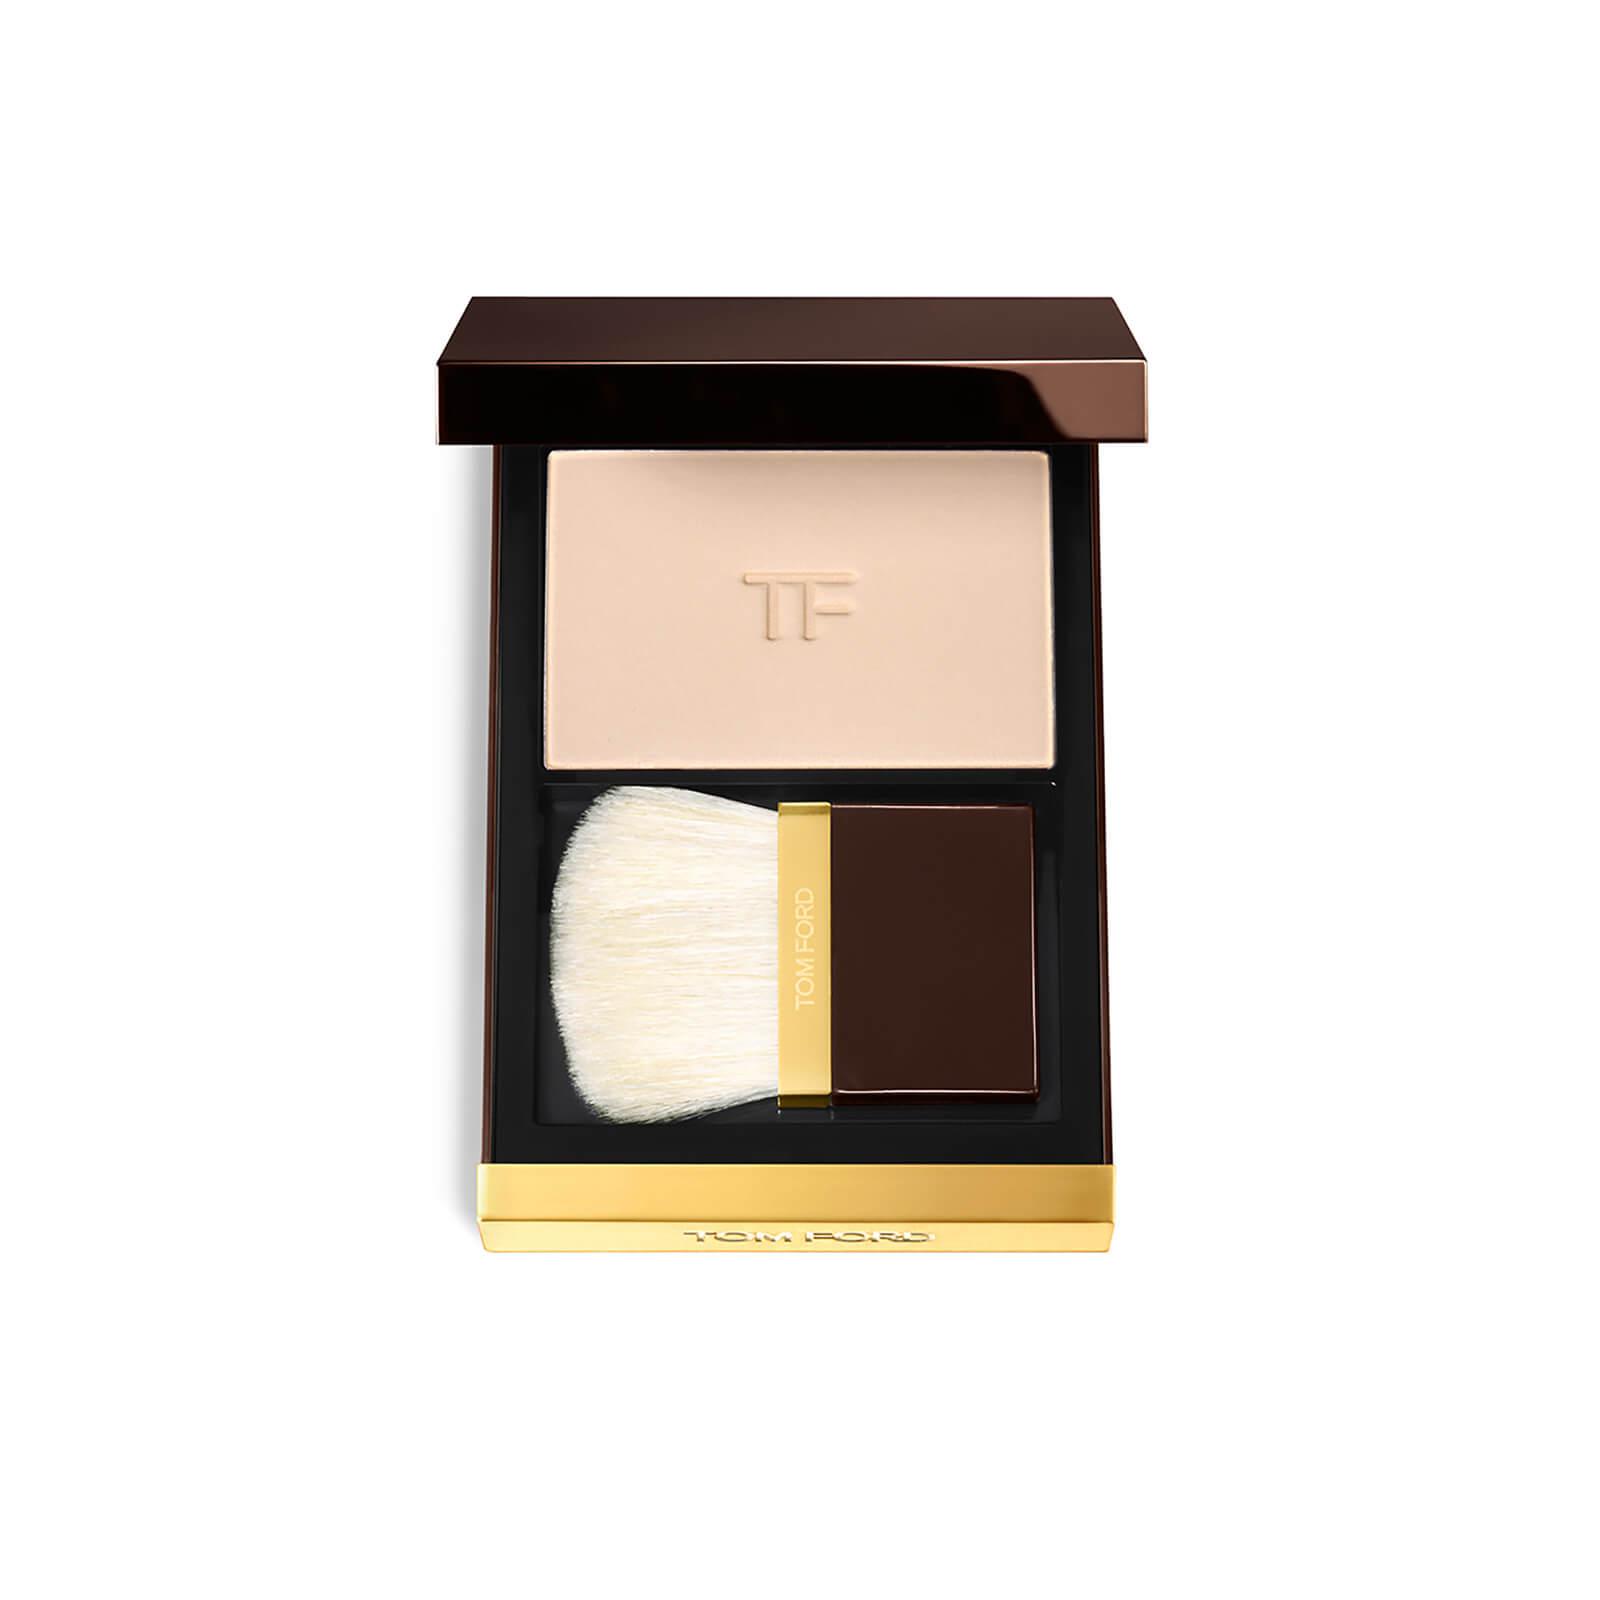 Tom Ford Translucent Finishing Powder 9g (Various Shades) - Ivory Fawn